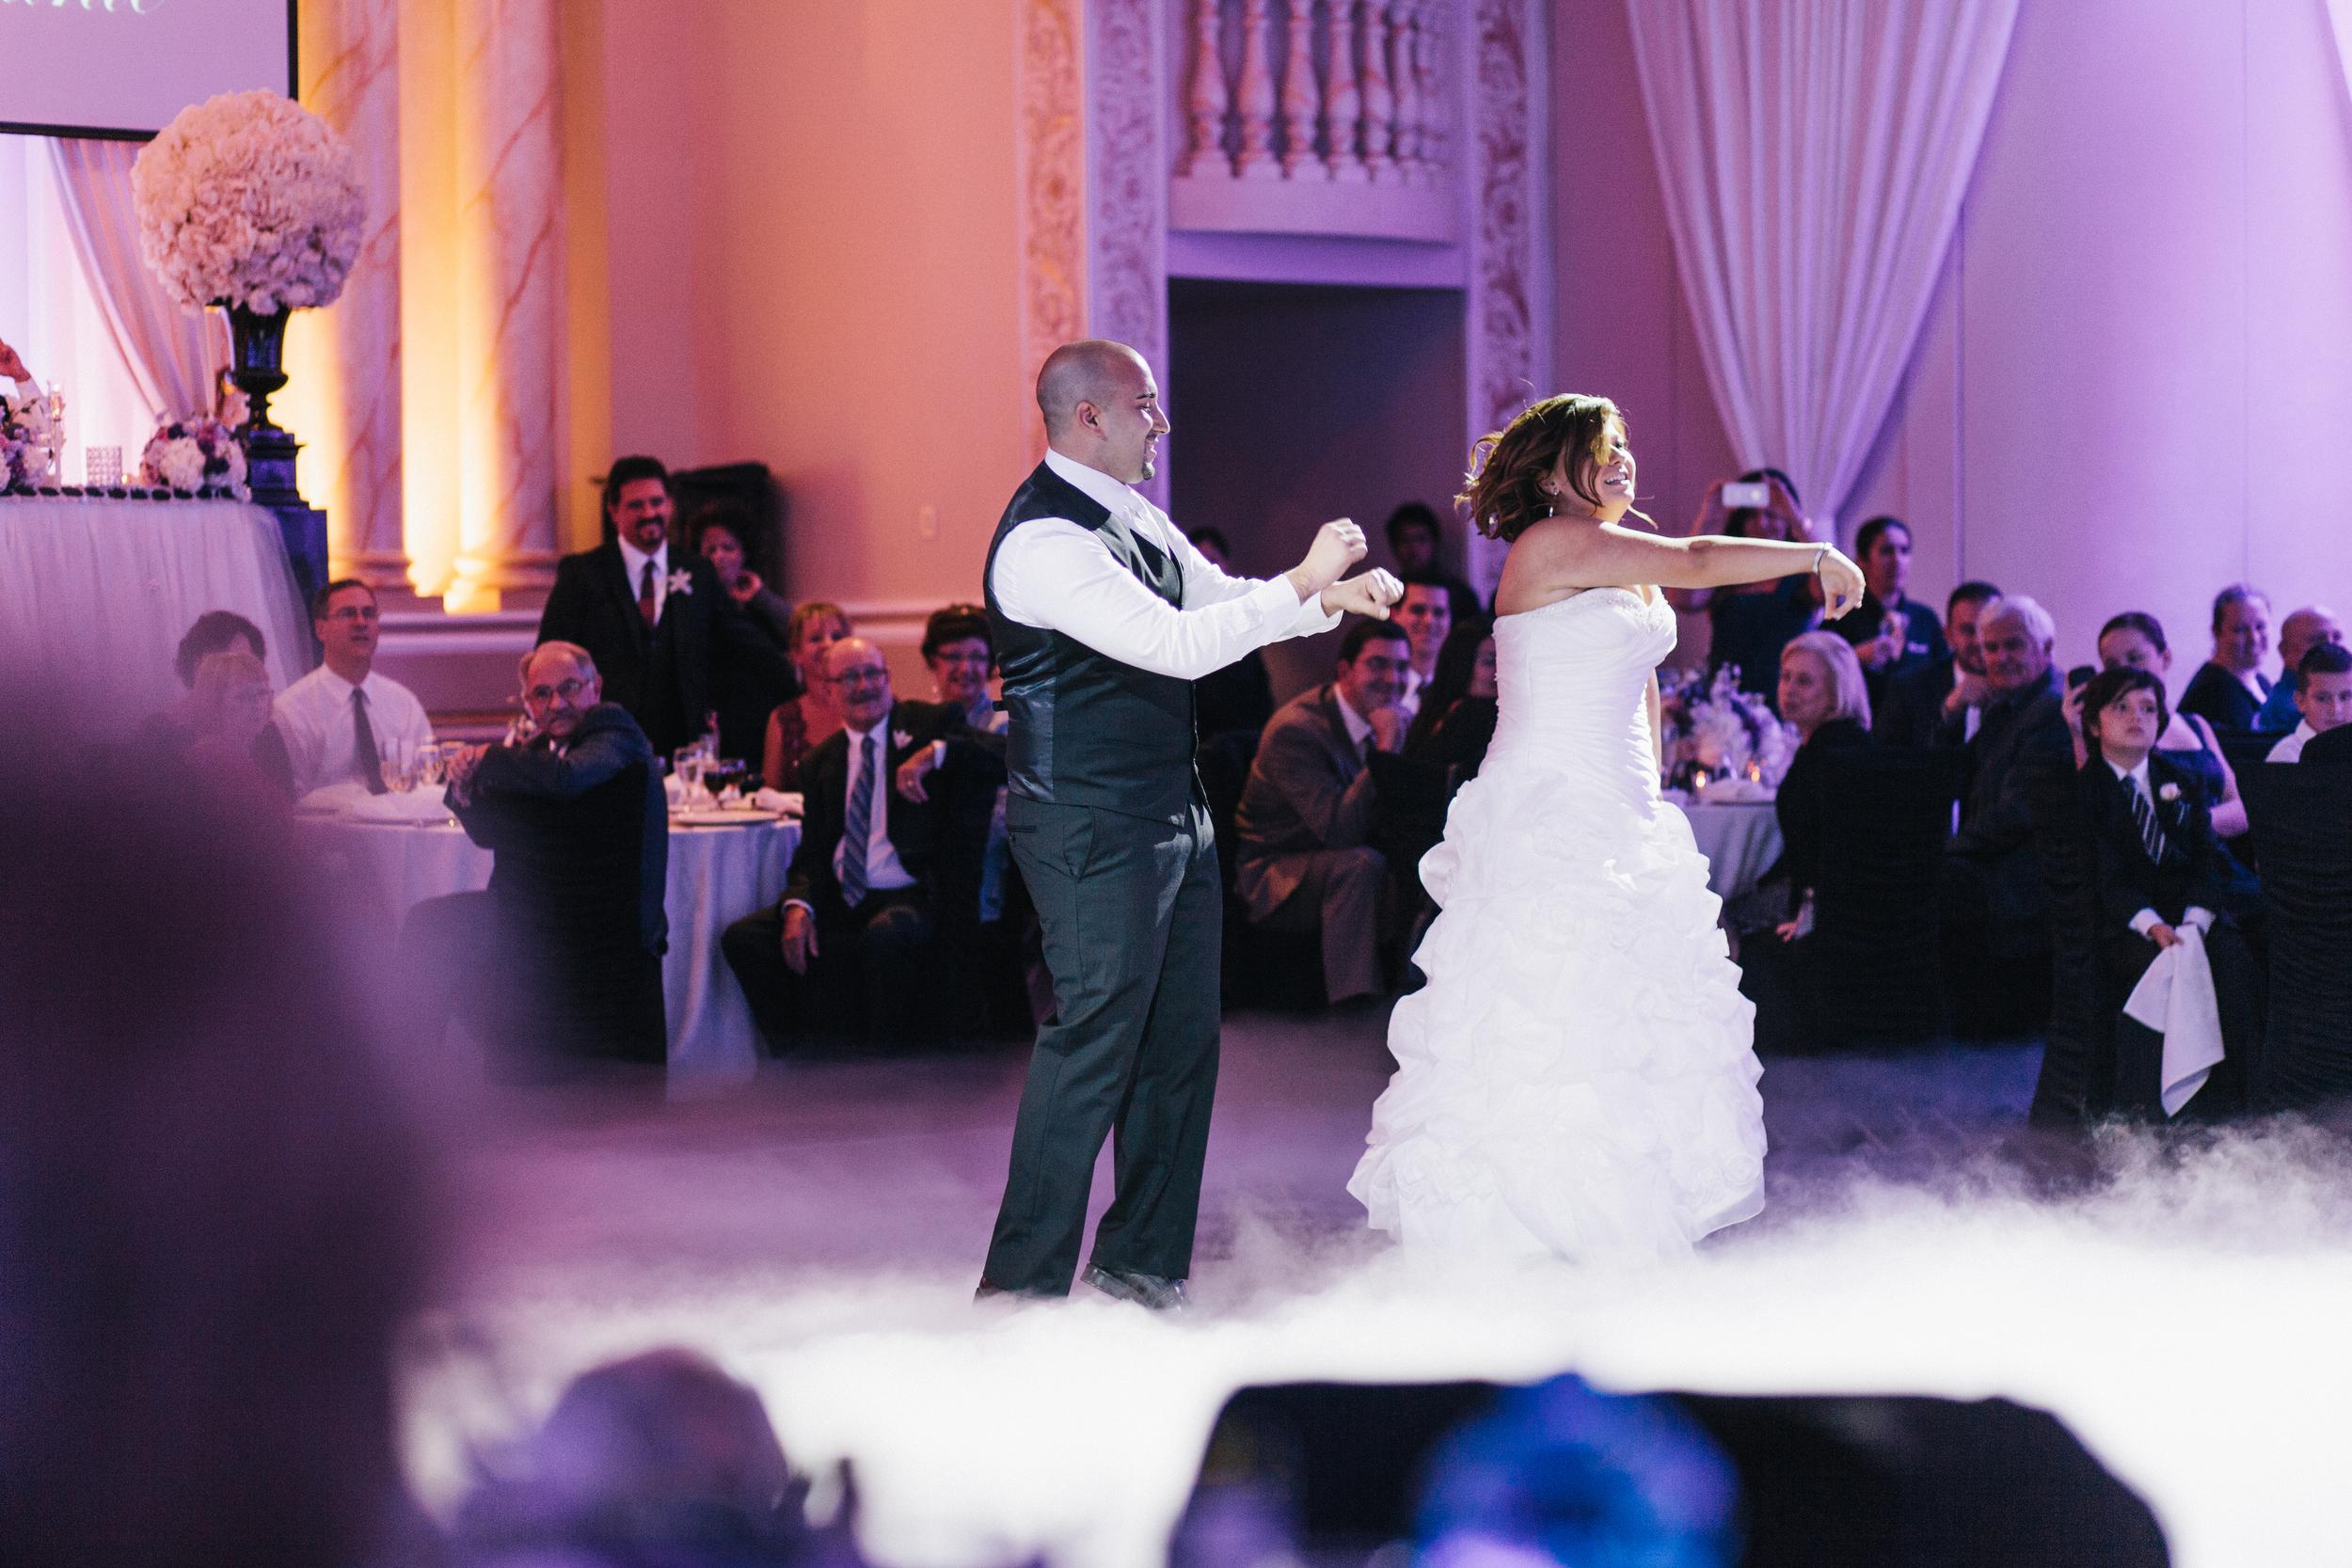 Stephanie-Kyle-paradise-banquet-hall-michael-rousseau-photography-best-toronto-wedding-photographer-documentary-wedding039.JPG